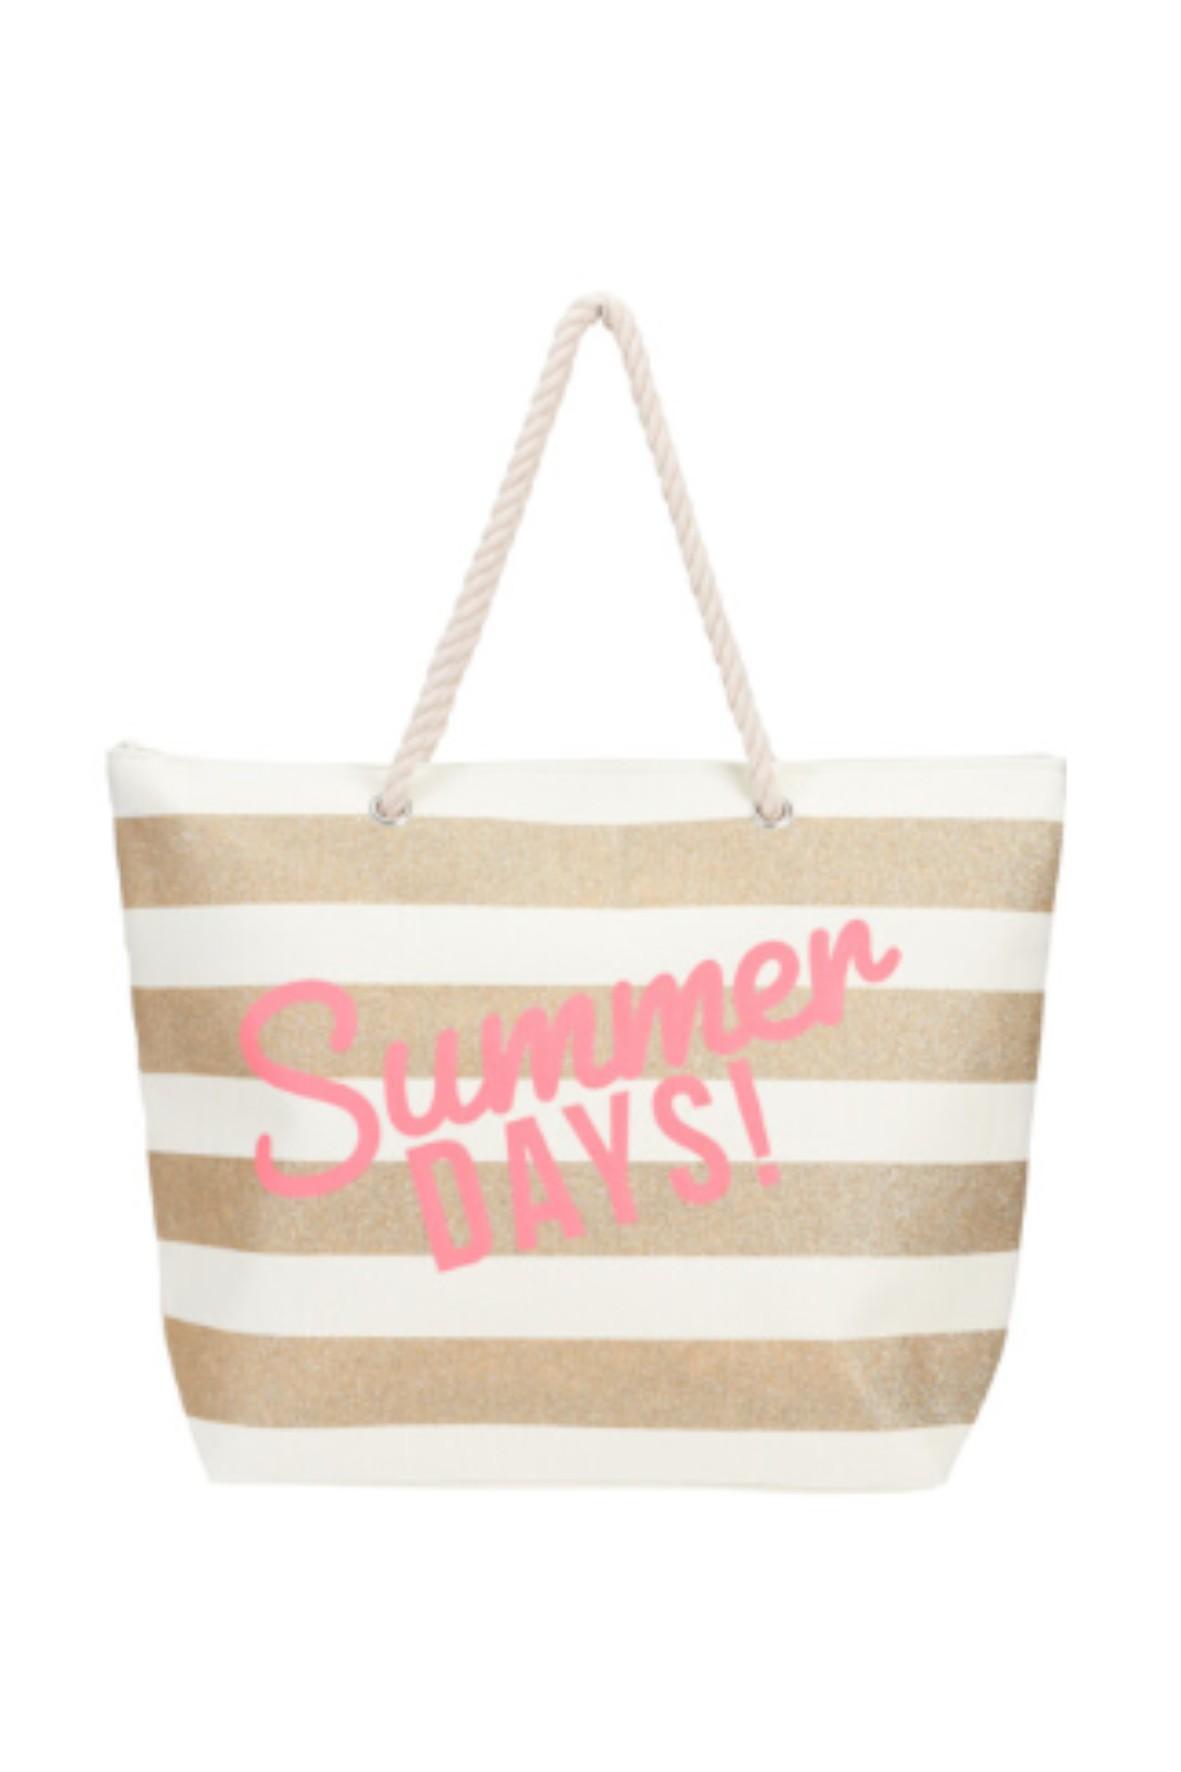 Torebka damska plażowa w paski z napisem Summer Days